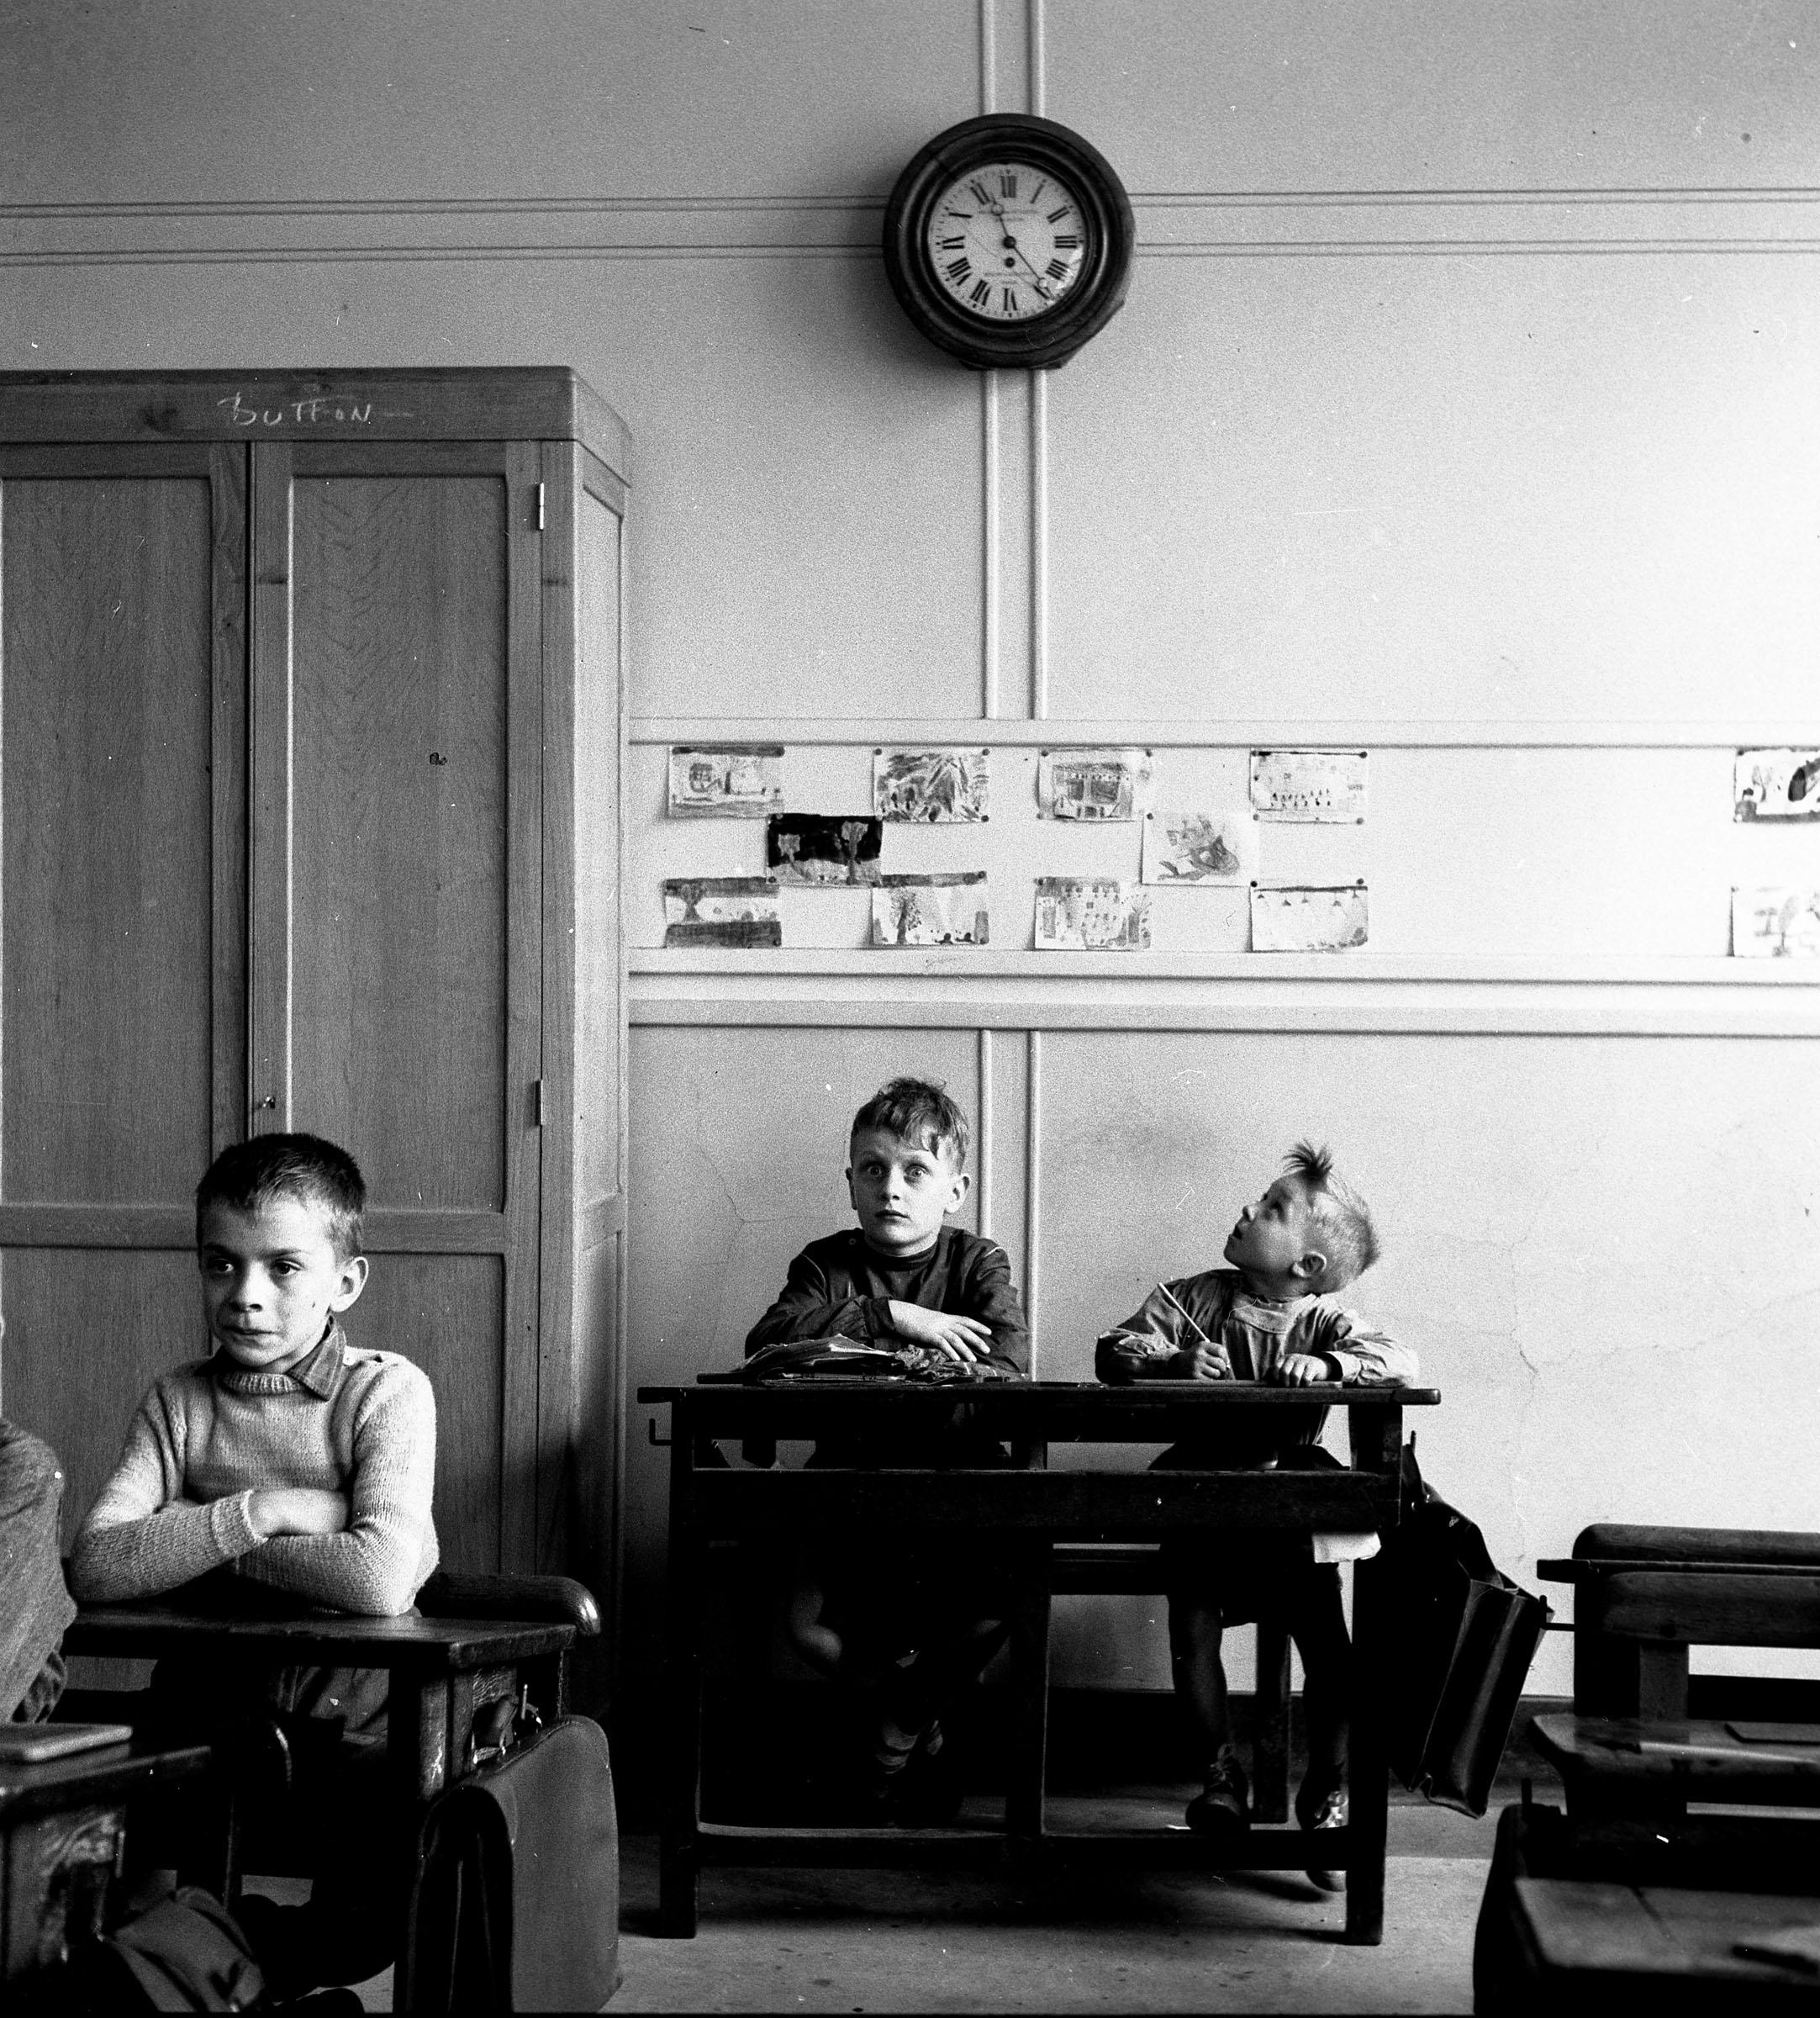 Robert Doisneau. Pêcheur d'images – Pescatore di immagini | Photoconsortium  Association